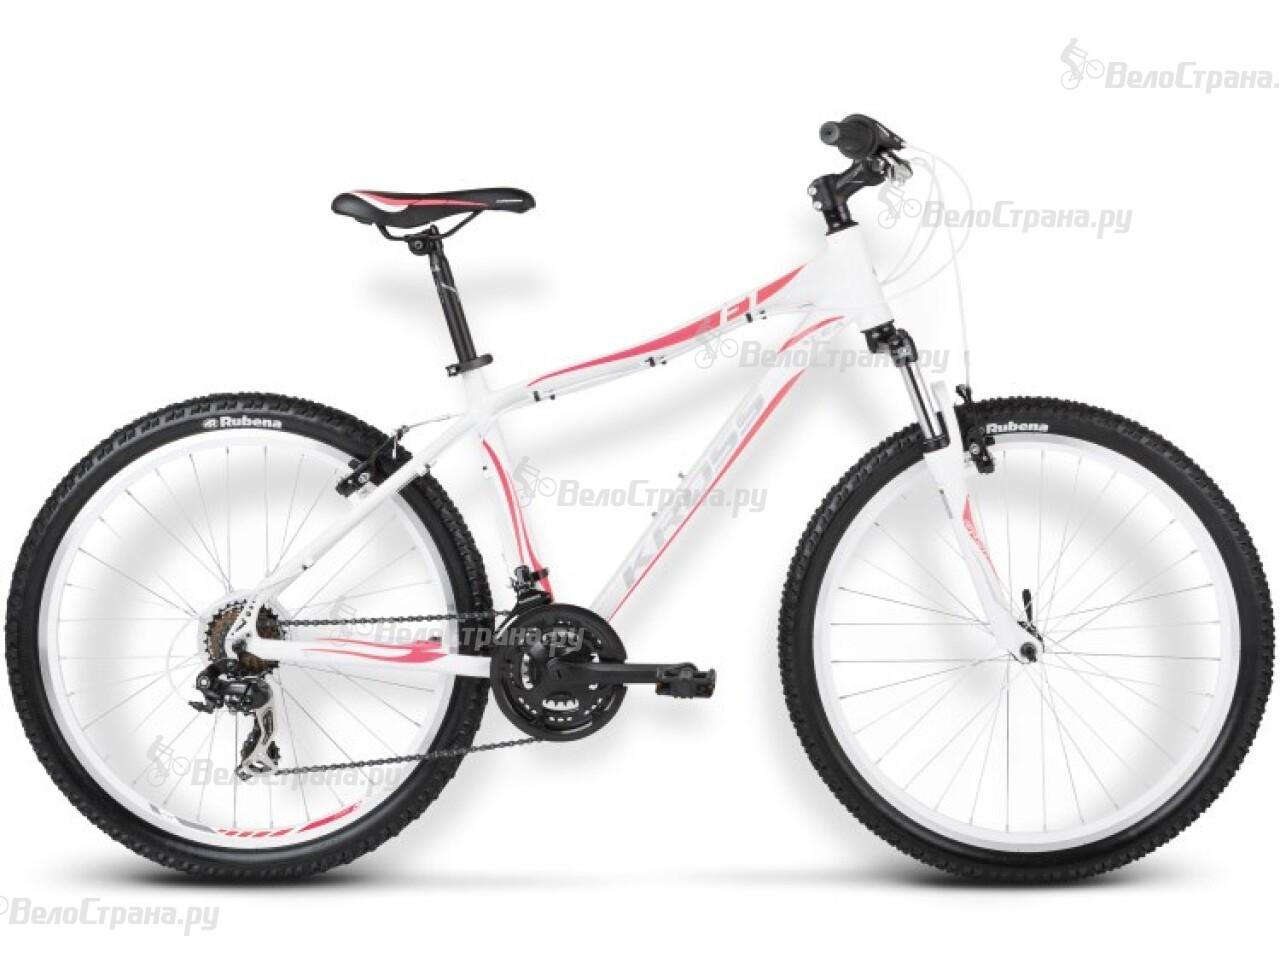 Велосипед Kross Lea F1 (2015) велосипед kross pulso 1 2015